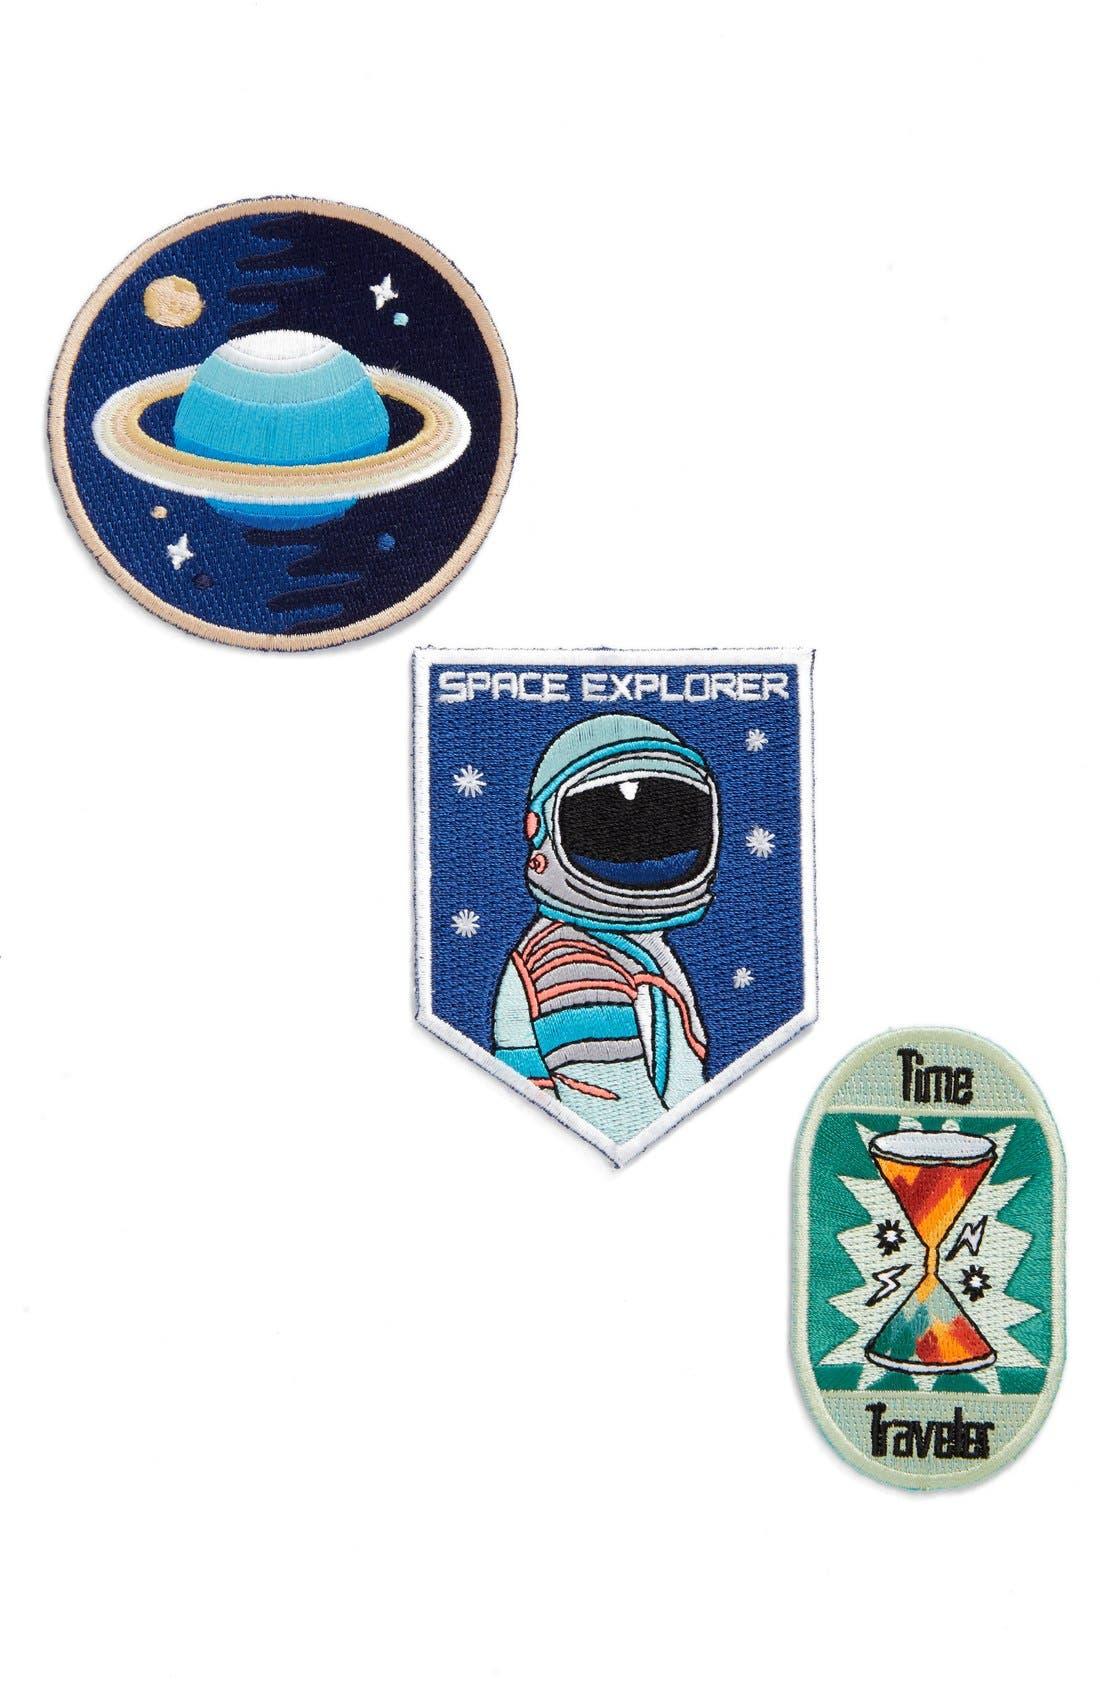 Main Image - Mokuyobi 'Space Traveler' Iron-On Patches (Set of 3)